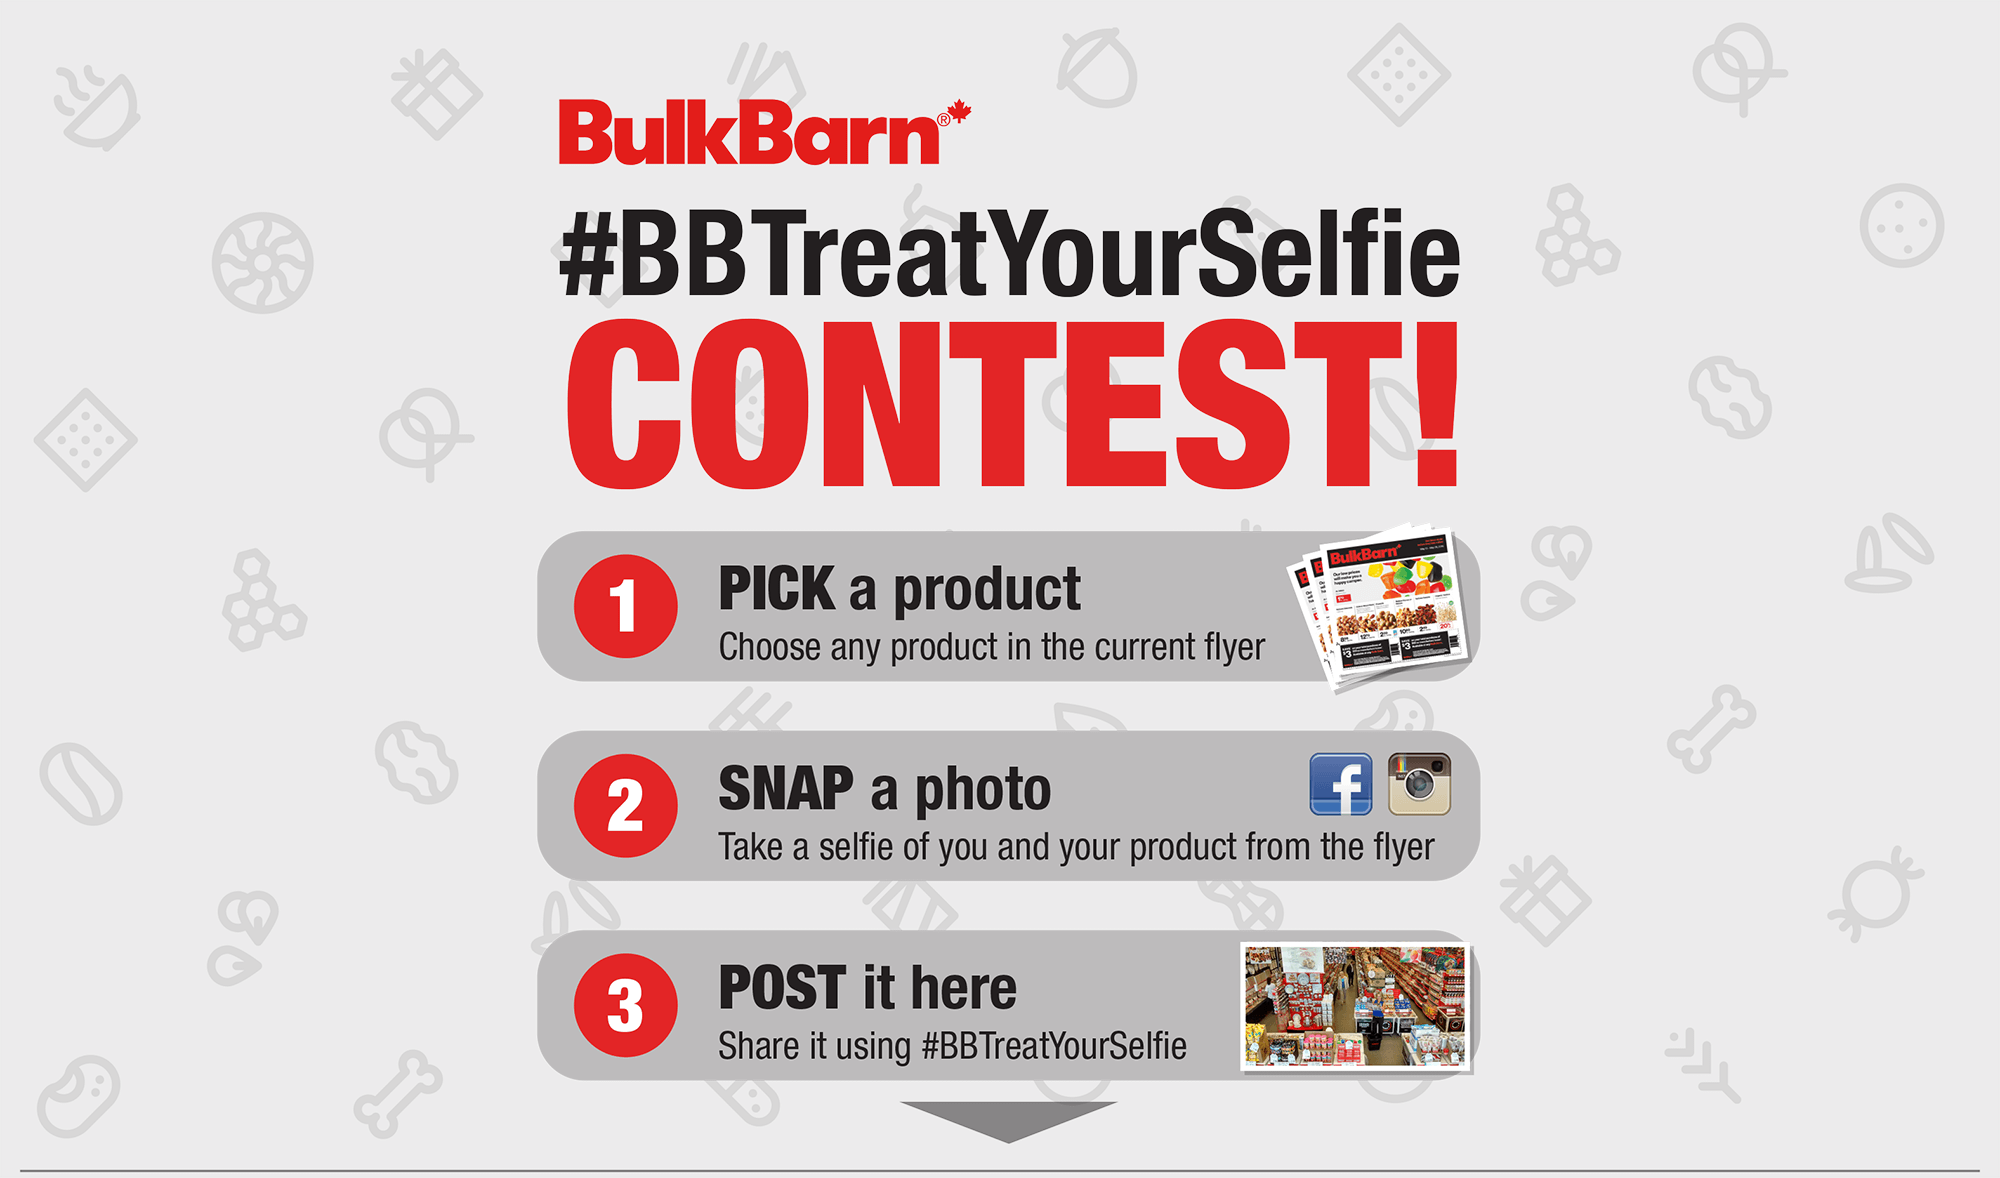 #BBTreatYourSelfie Photo Contest